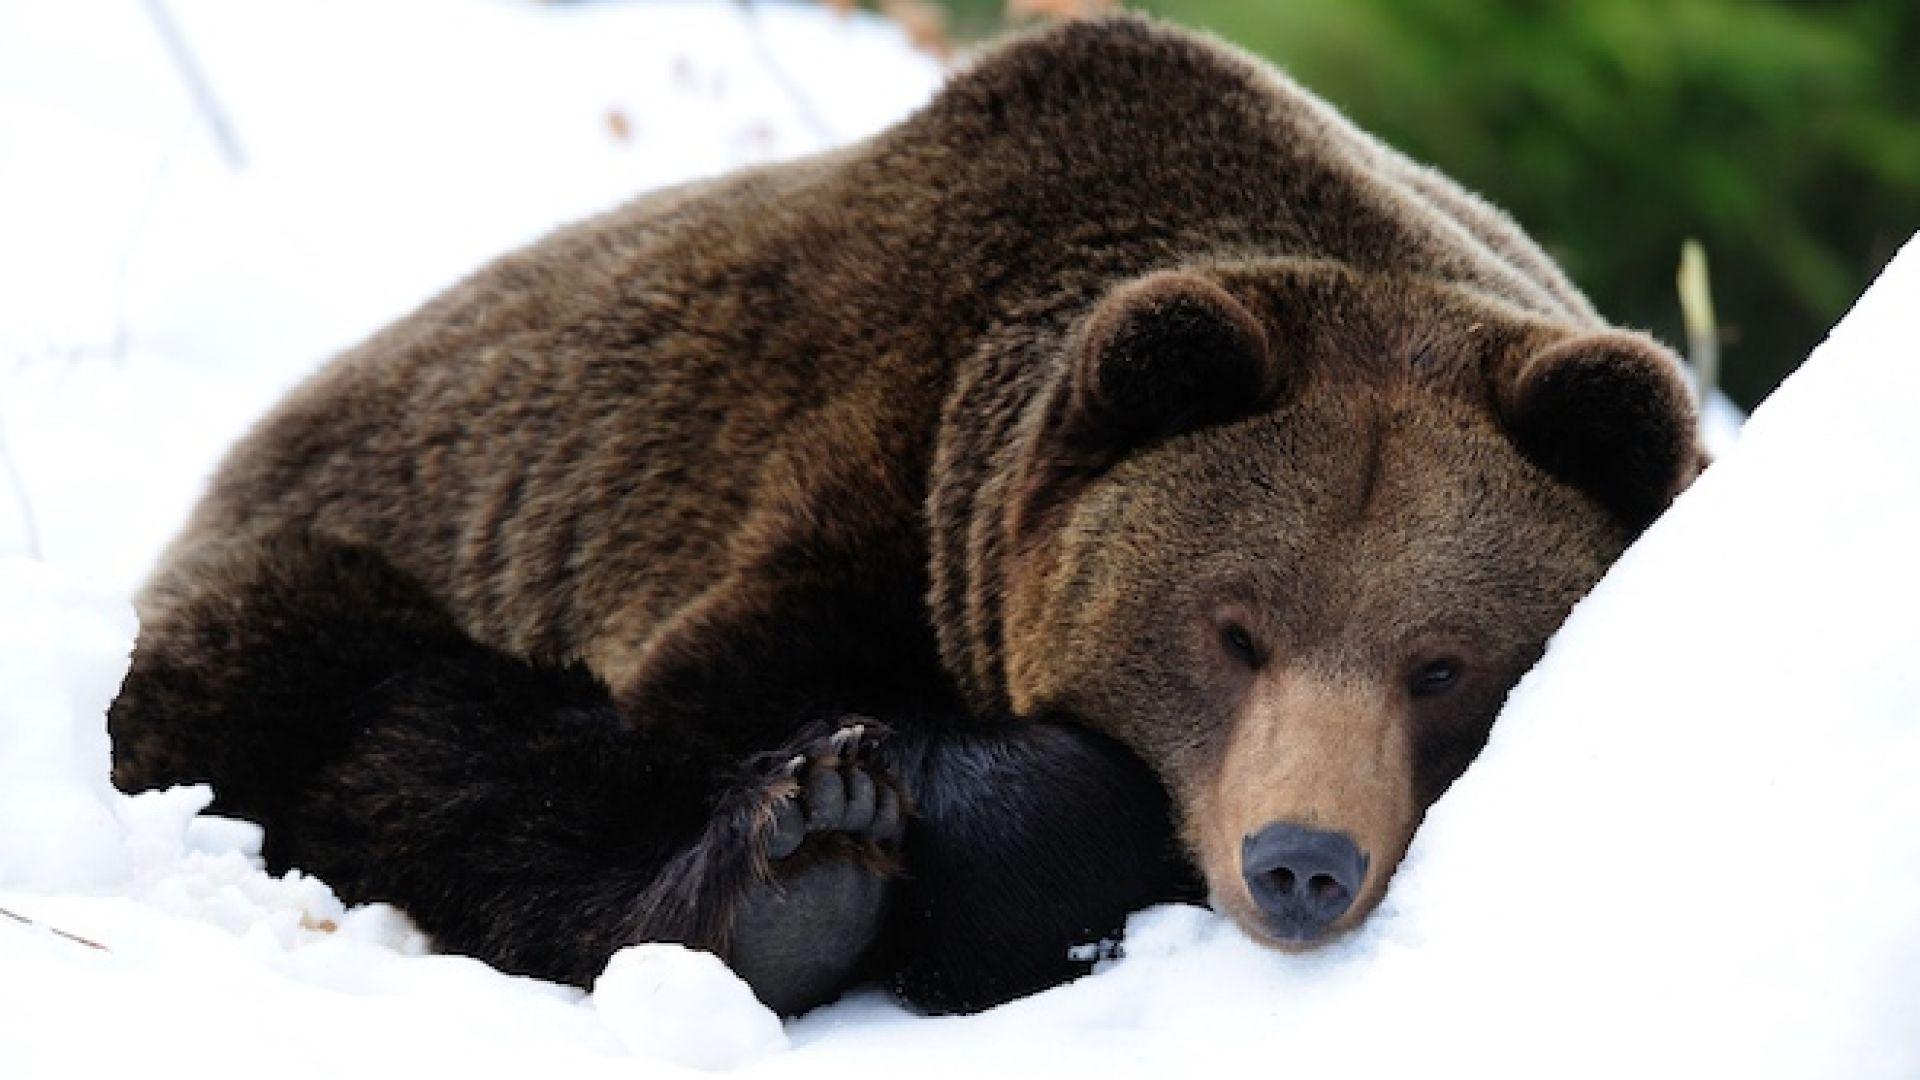 Военни ще охраняват мечка, заспала до свръхсекретен обект